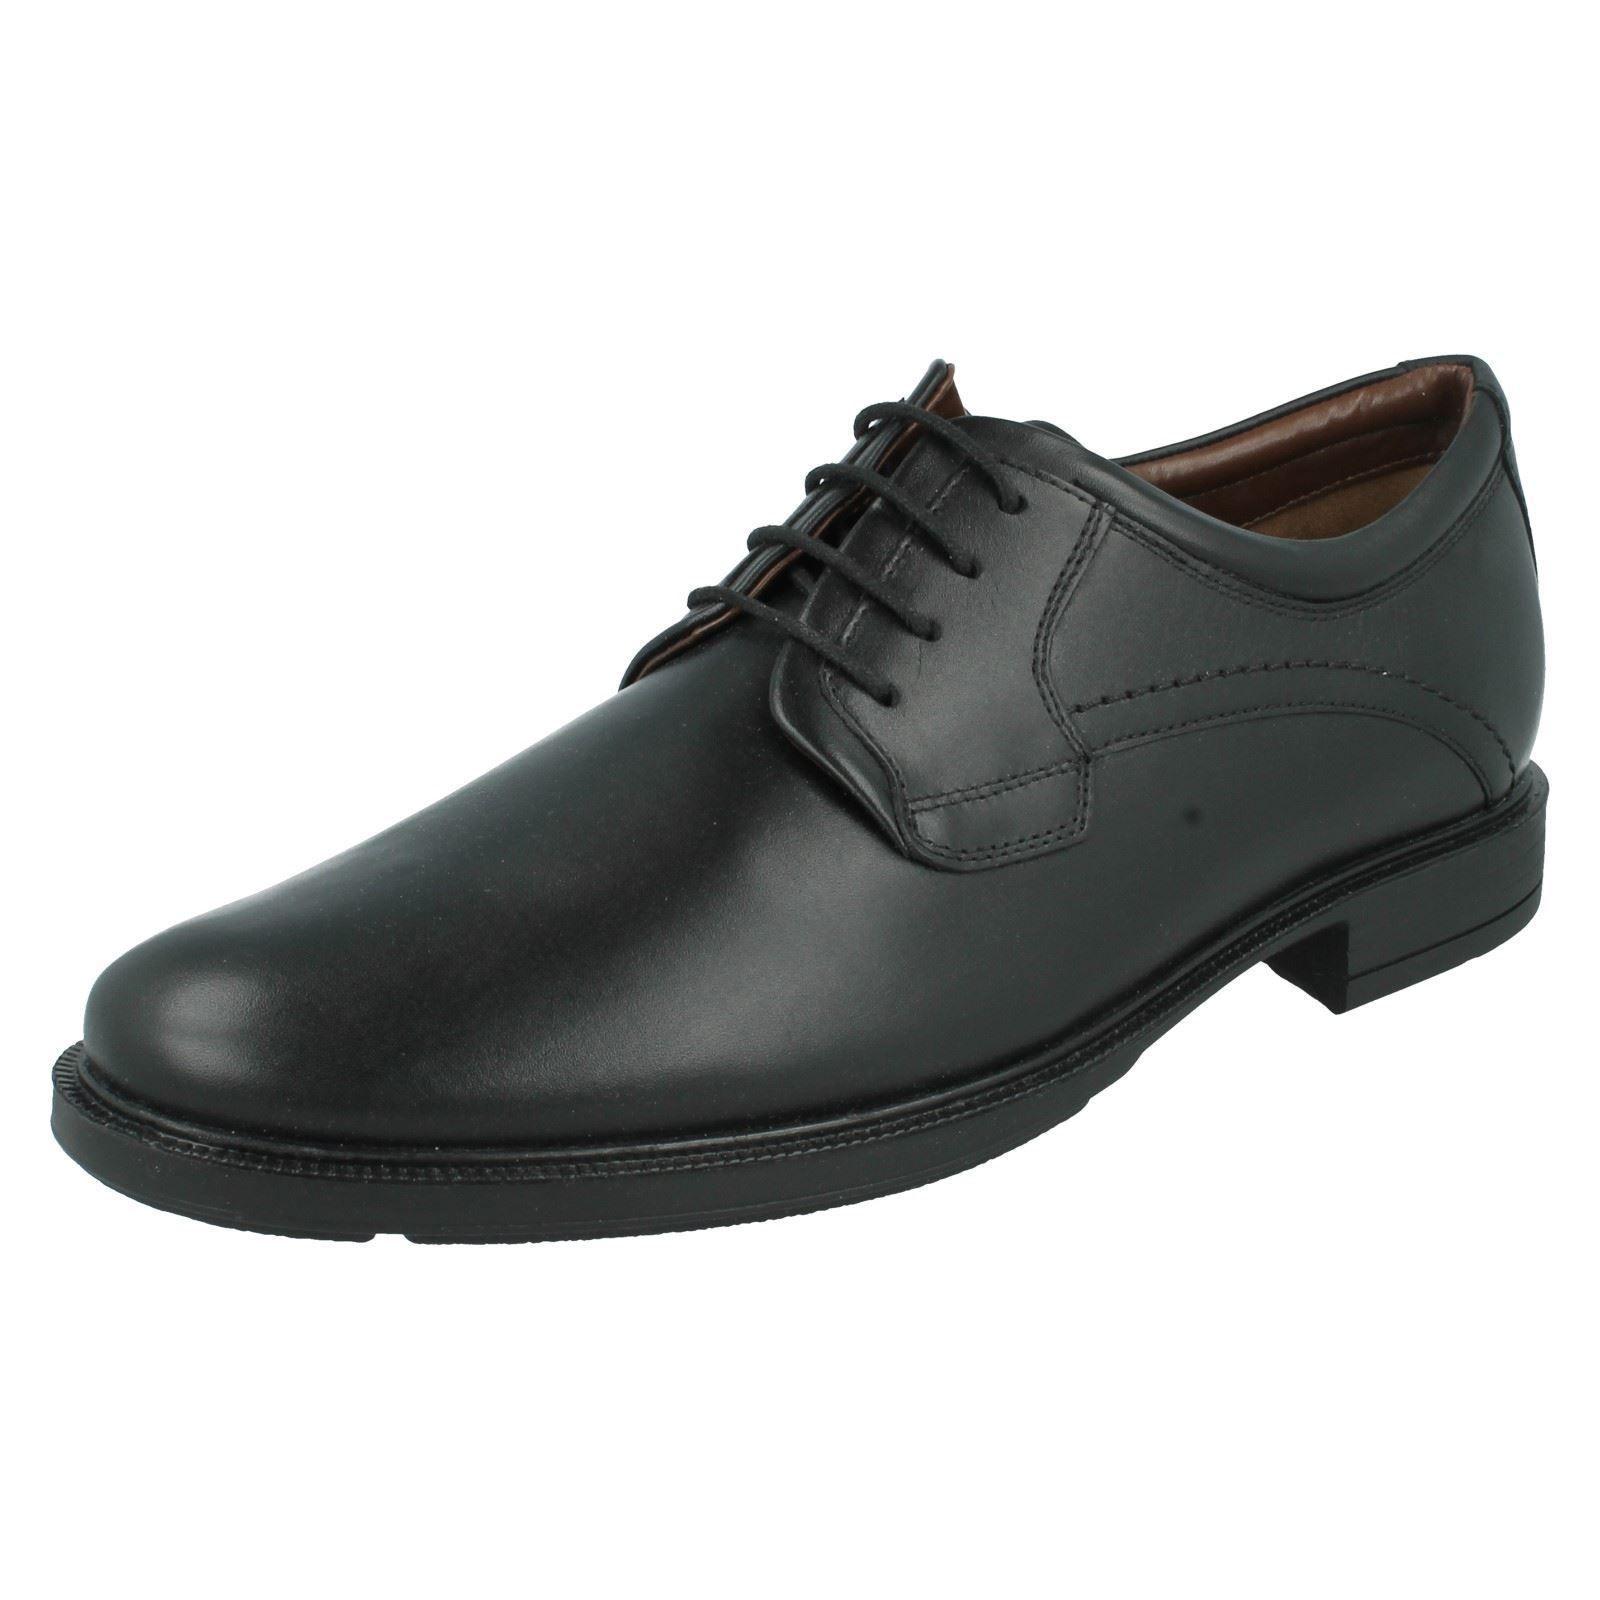 Hush puppies black lace up leather shoe style michigan 3